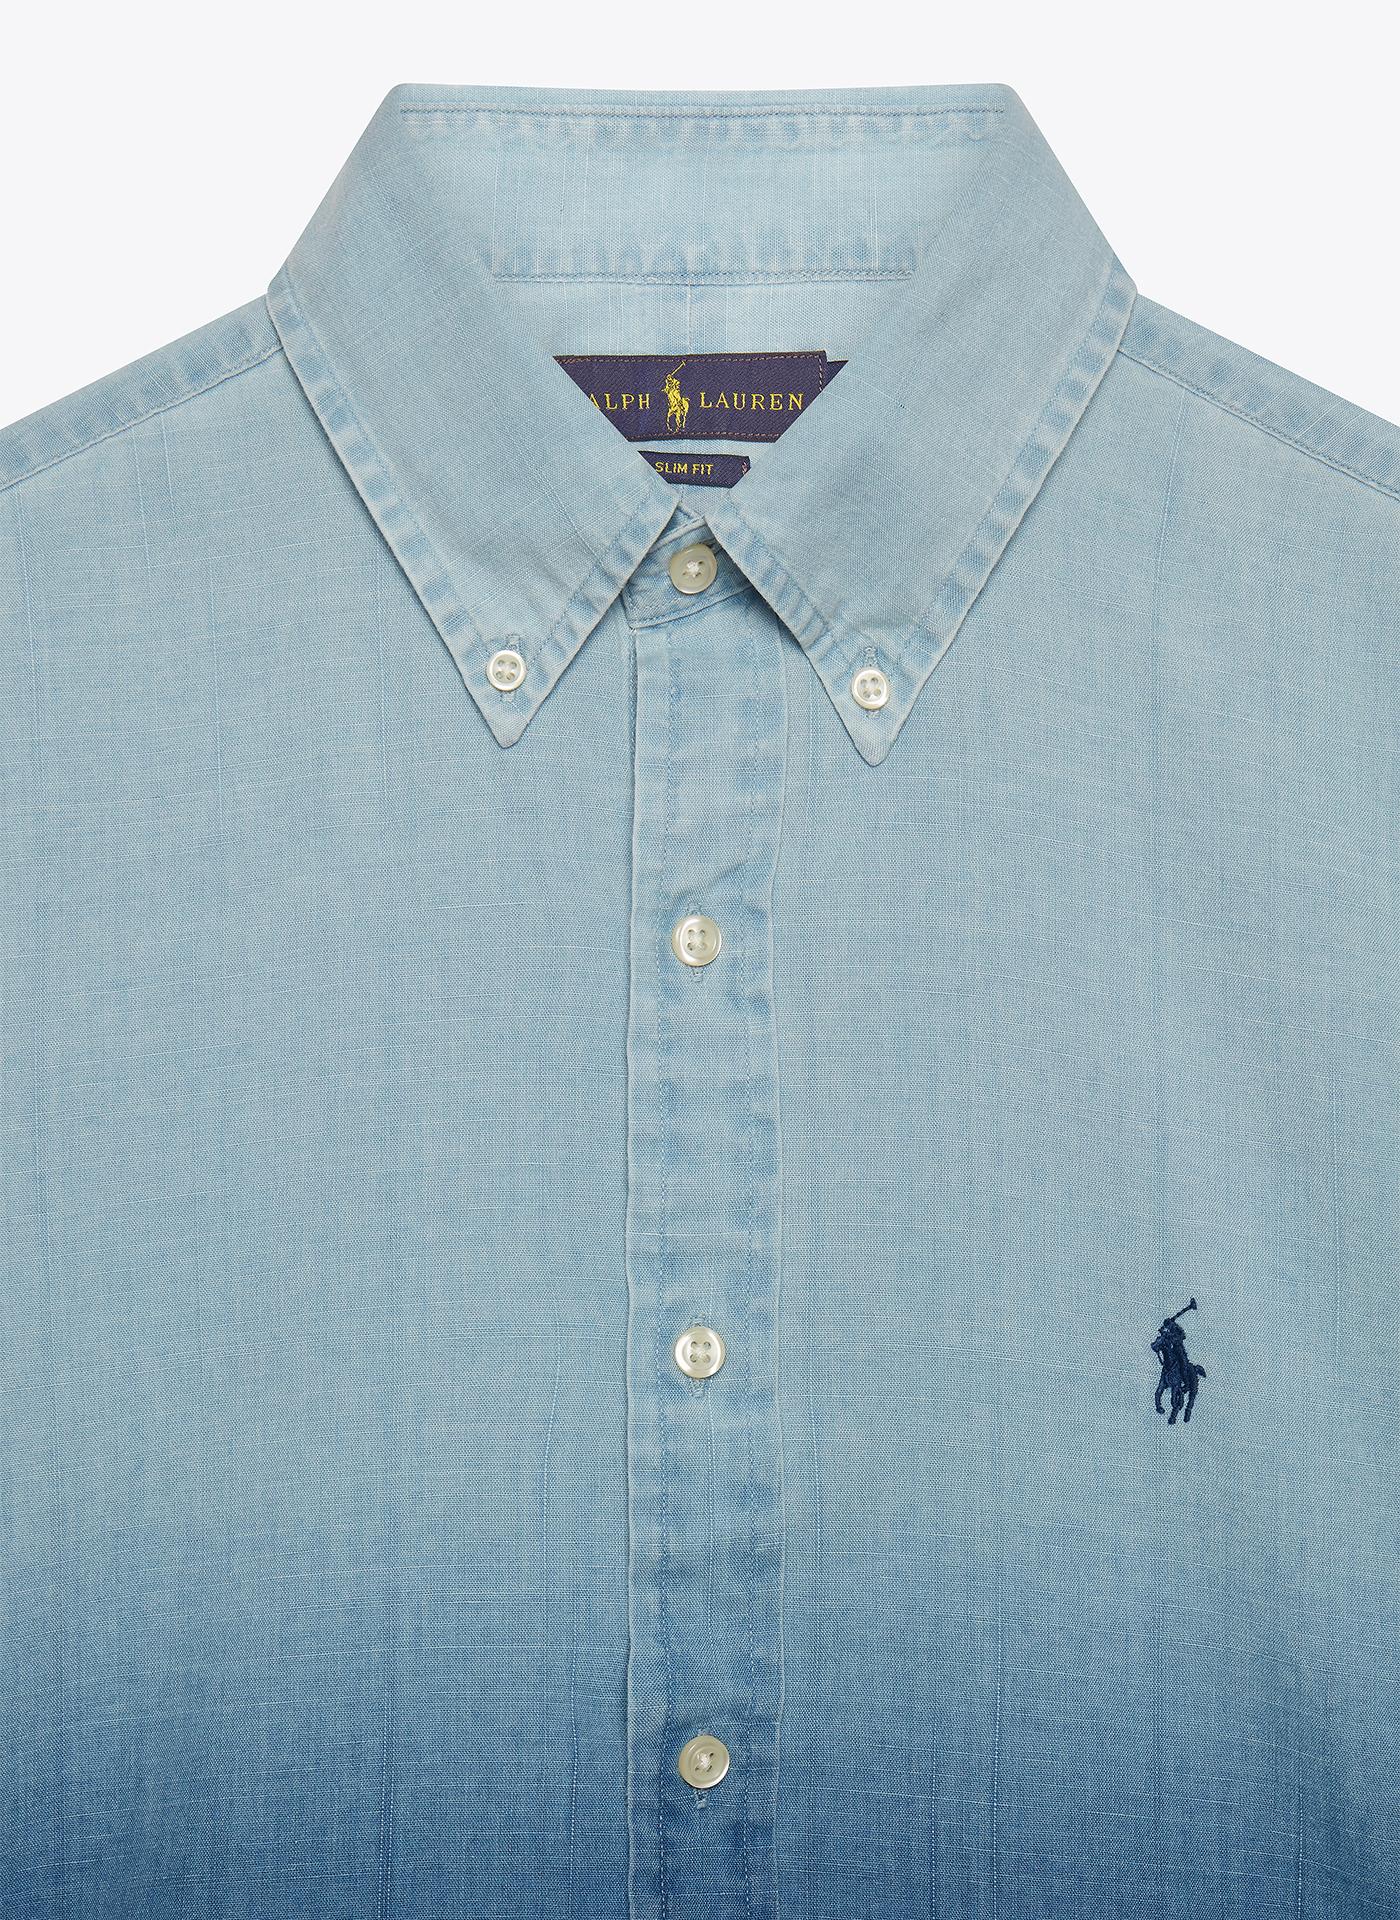 light blue denim shirt close up